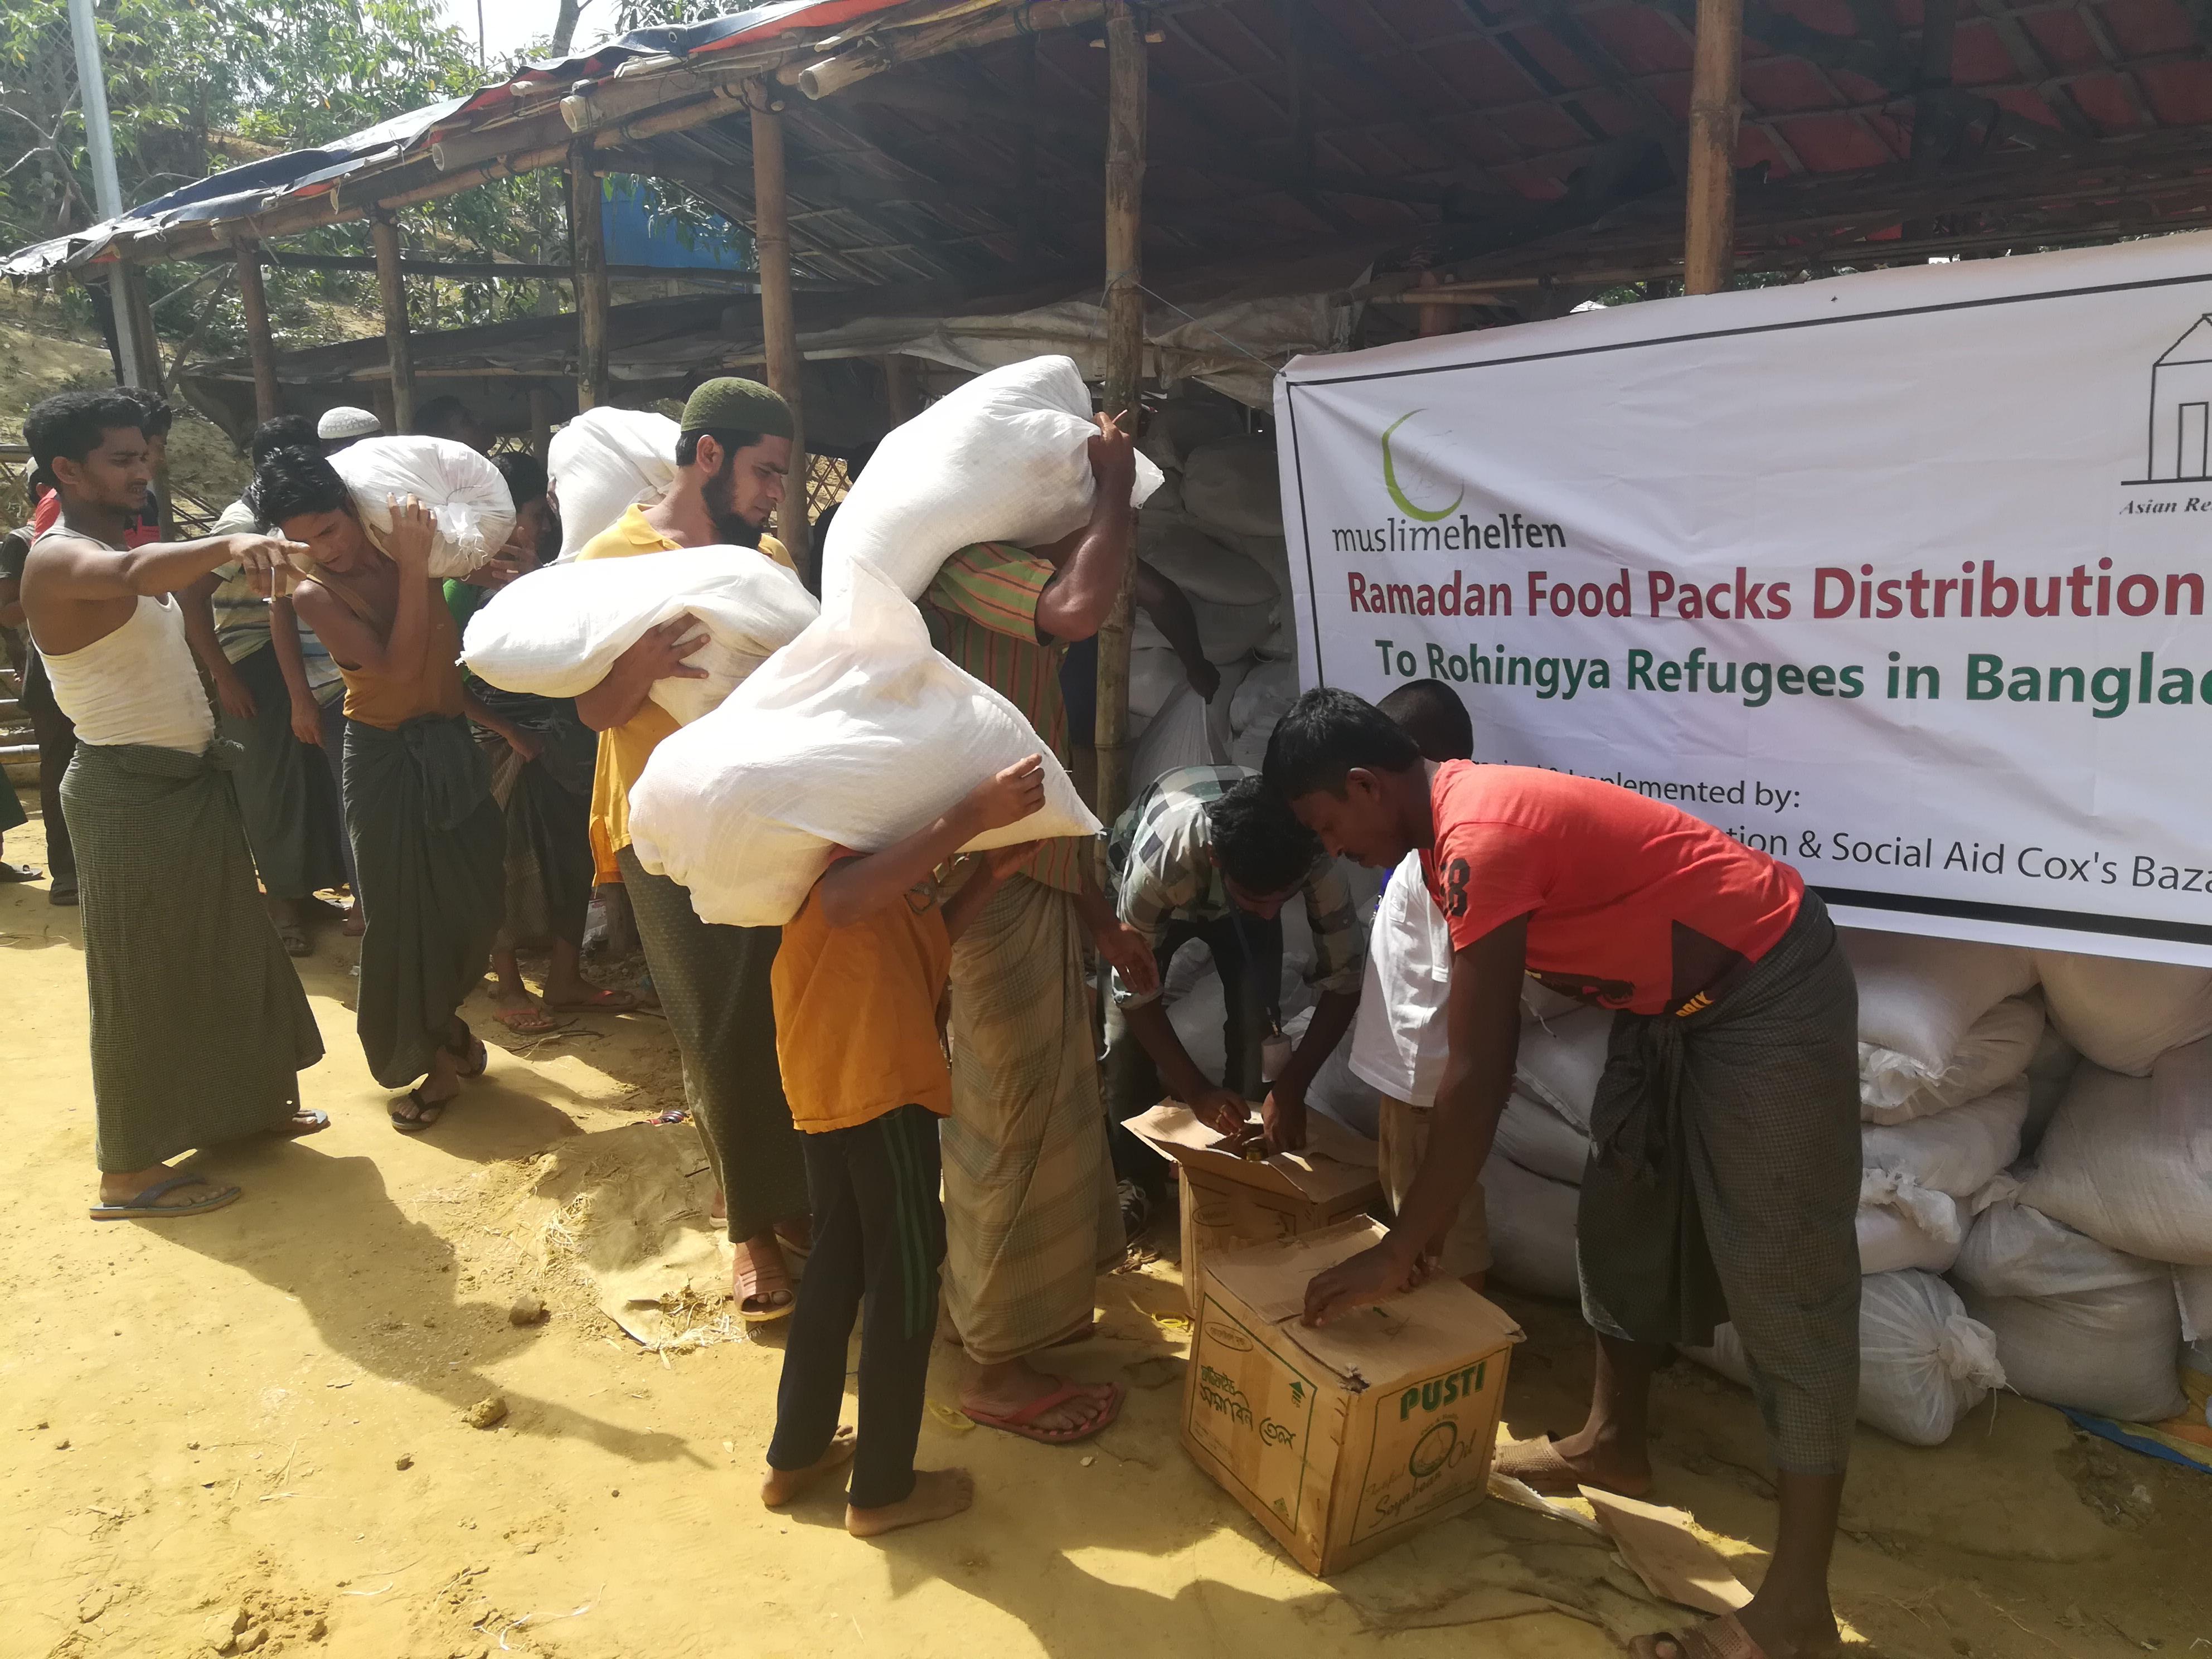 11 Ramadan Food Packs Distribution, , Rohingya Refugee Camps, Cox's Bazar, Bangladesh